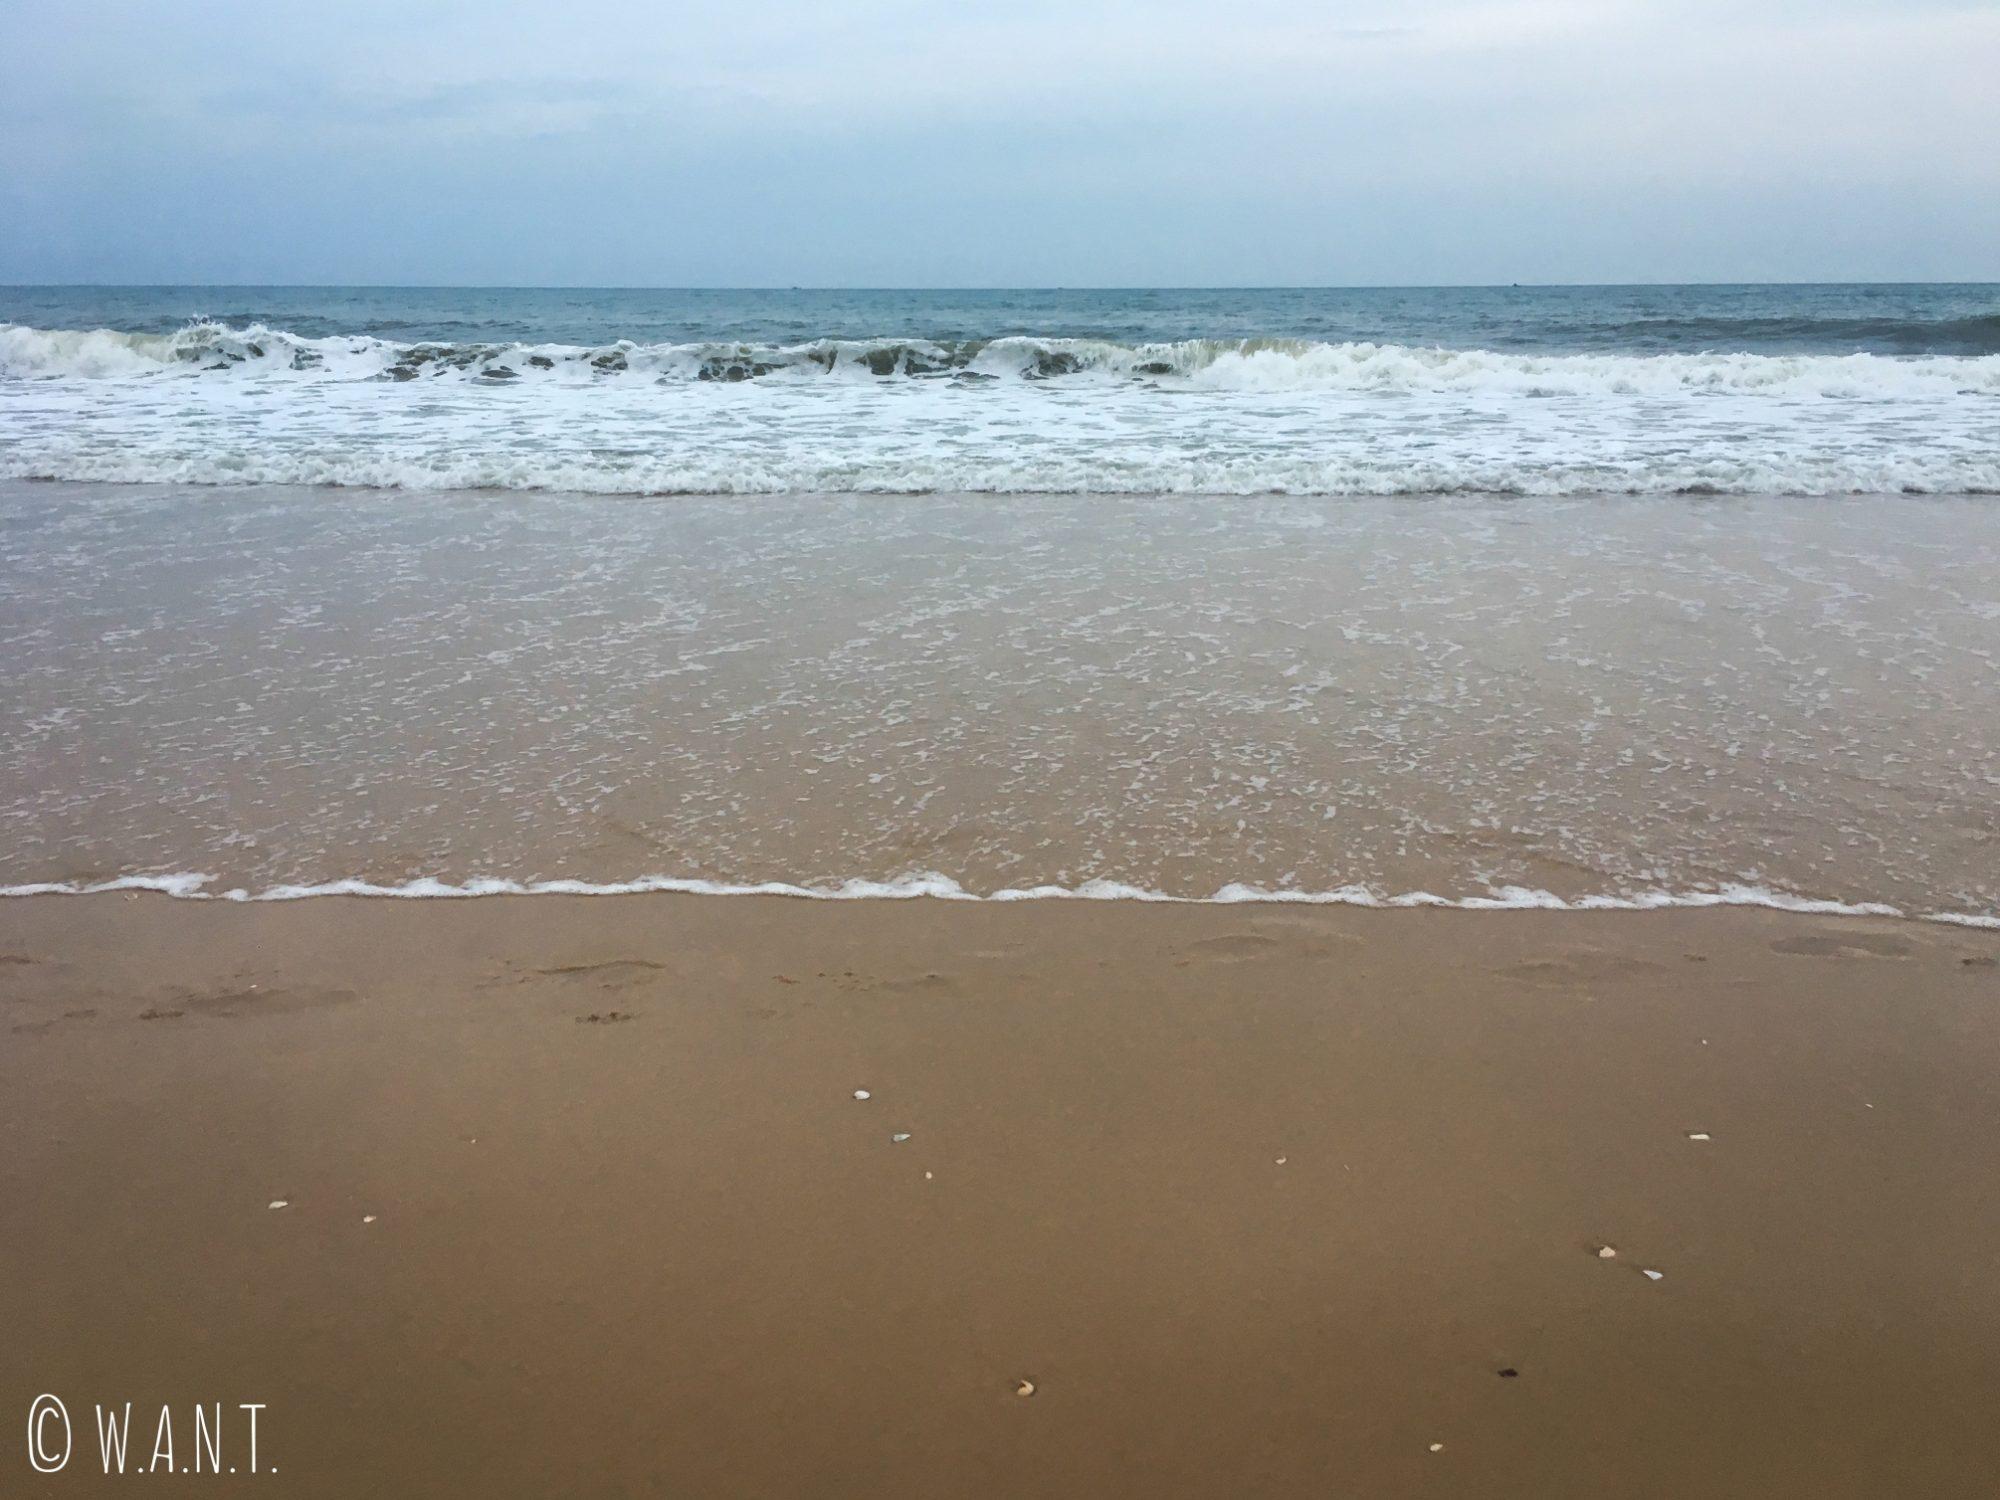 La mer de Chine méridonale borde le littoral de Mui Ne